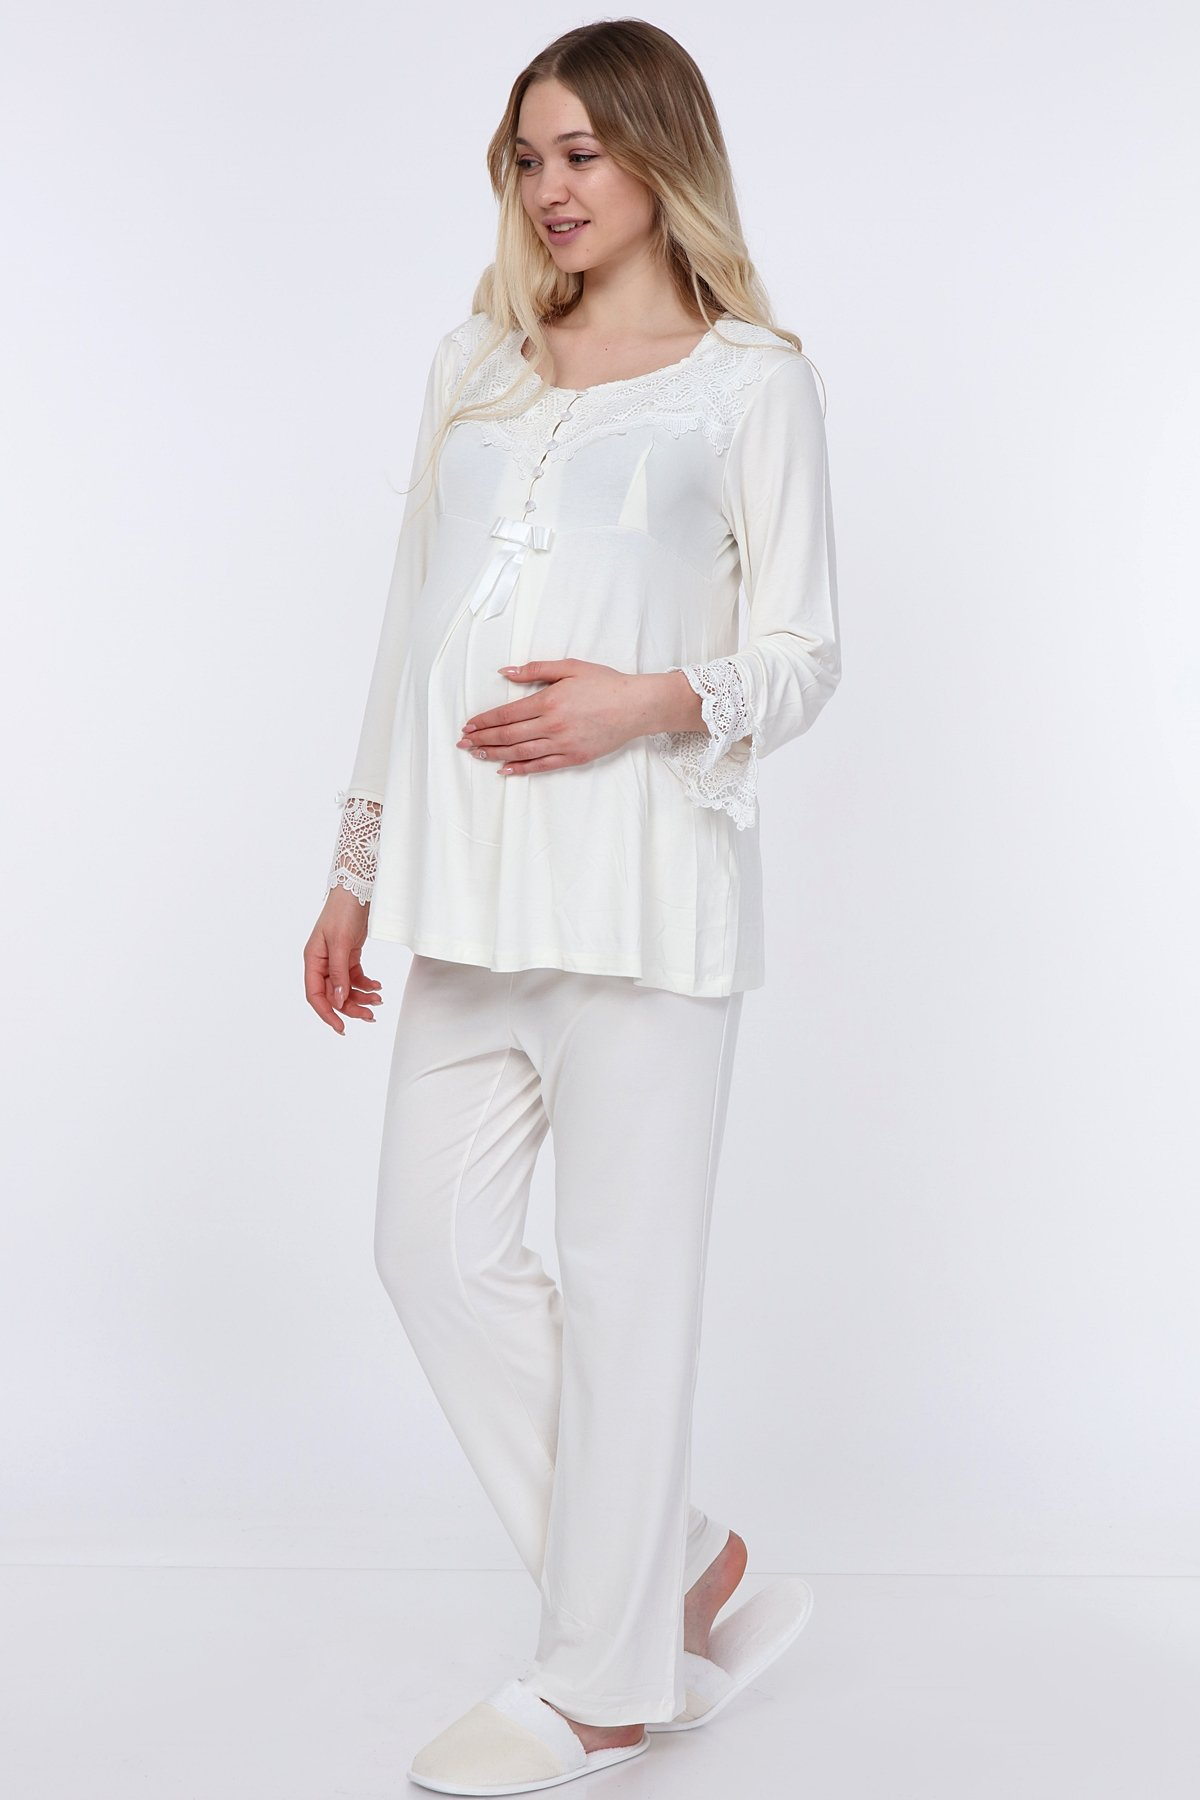 Luvmabelly Lvma9500 Women S Maternity Nursing Pajamas Hospital Set Soft Long Sleeved Button Tops Pj Pants Sleepwear Set Walmart Com Walmart Com